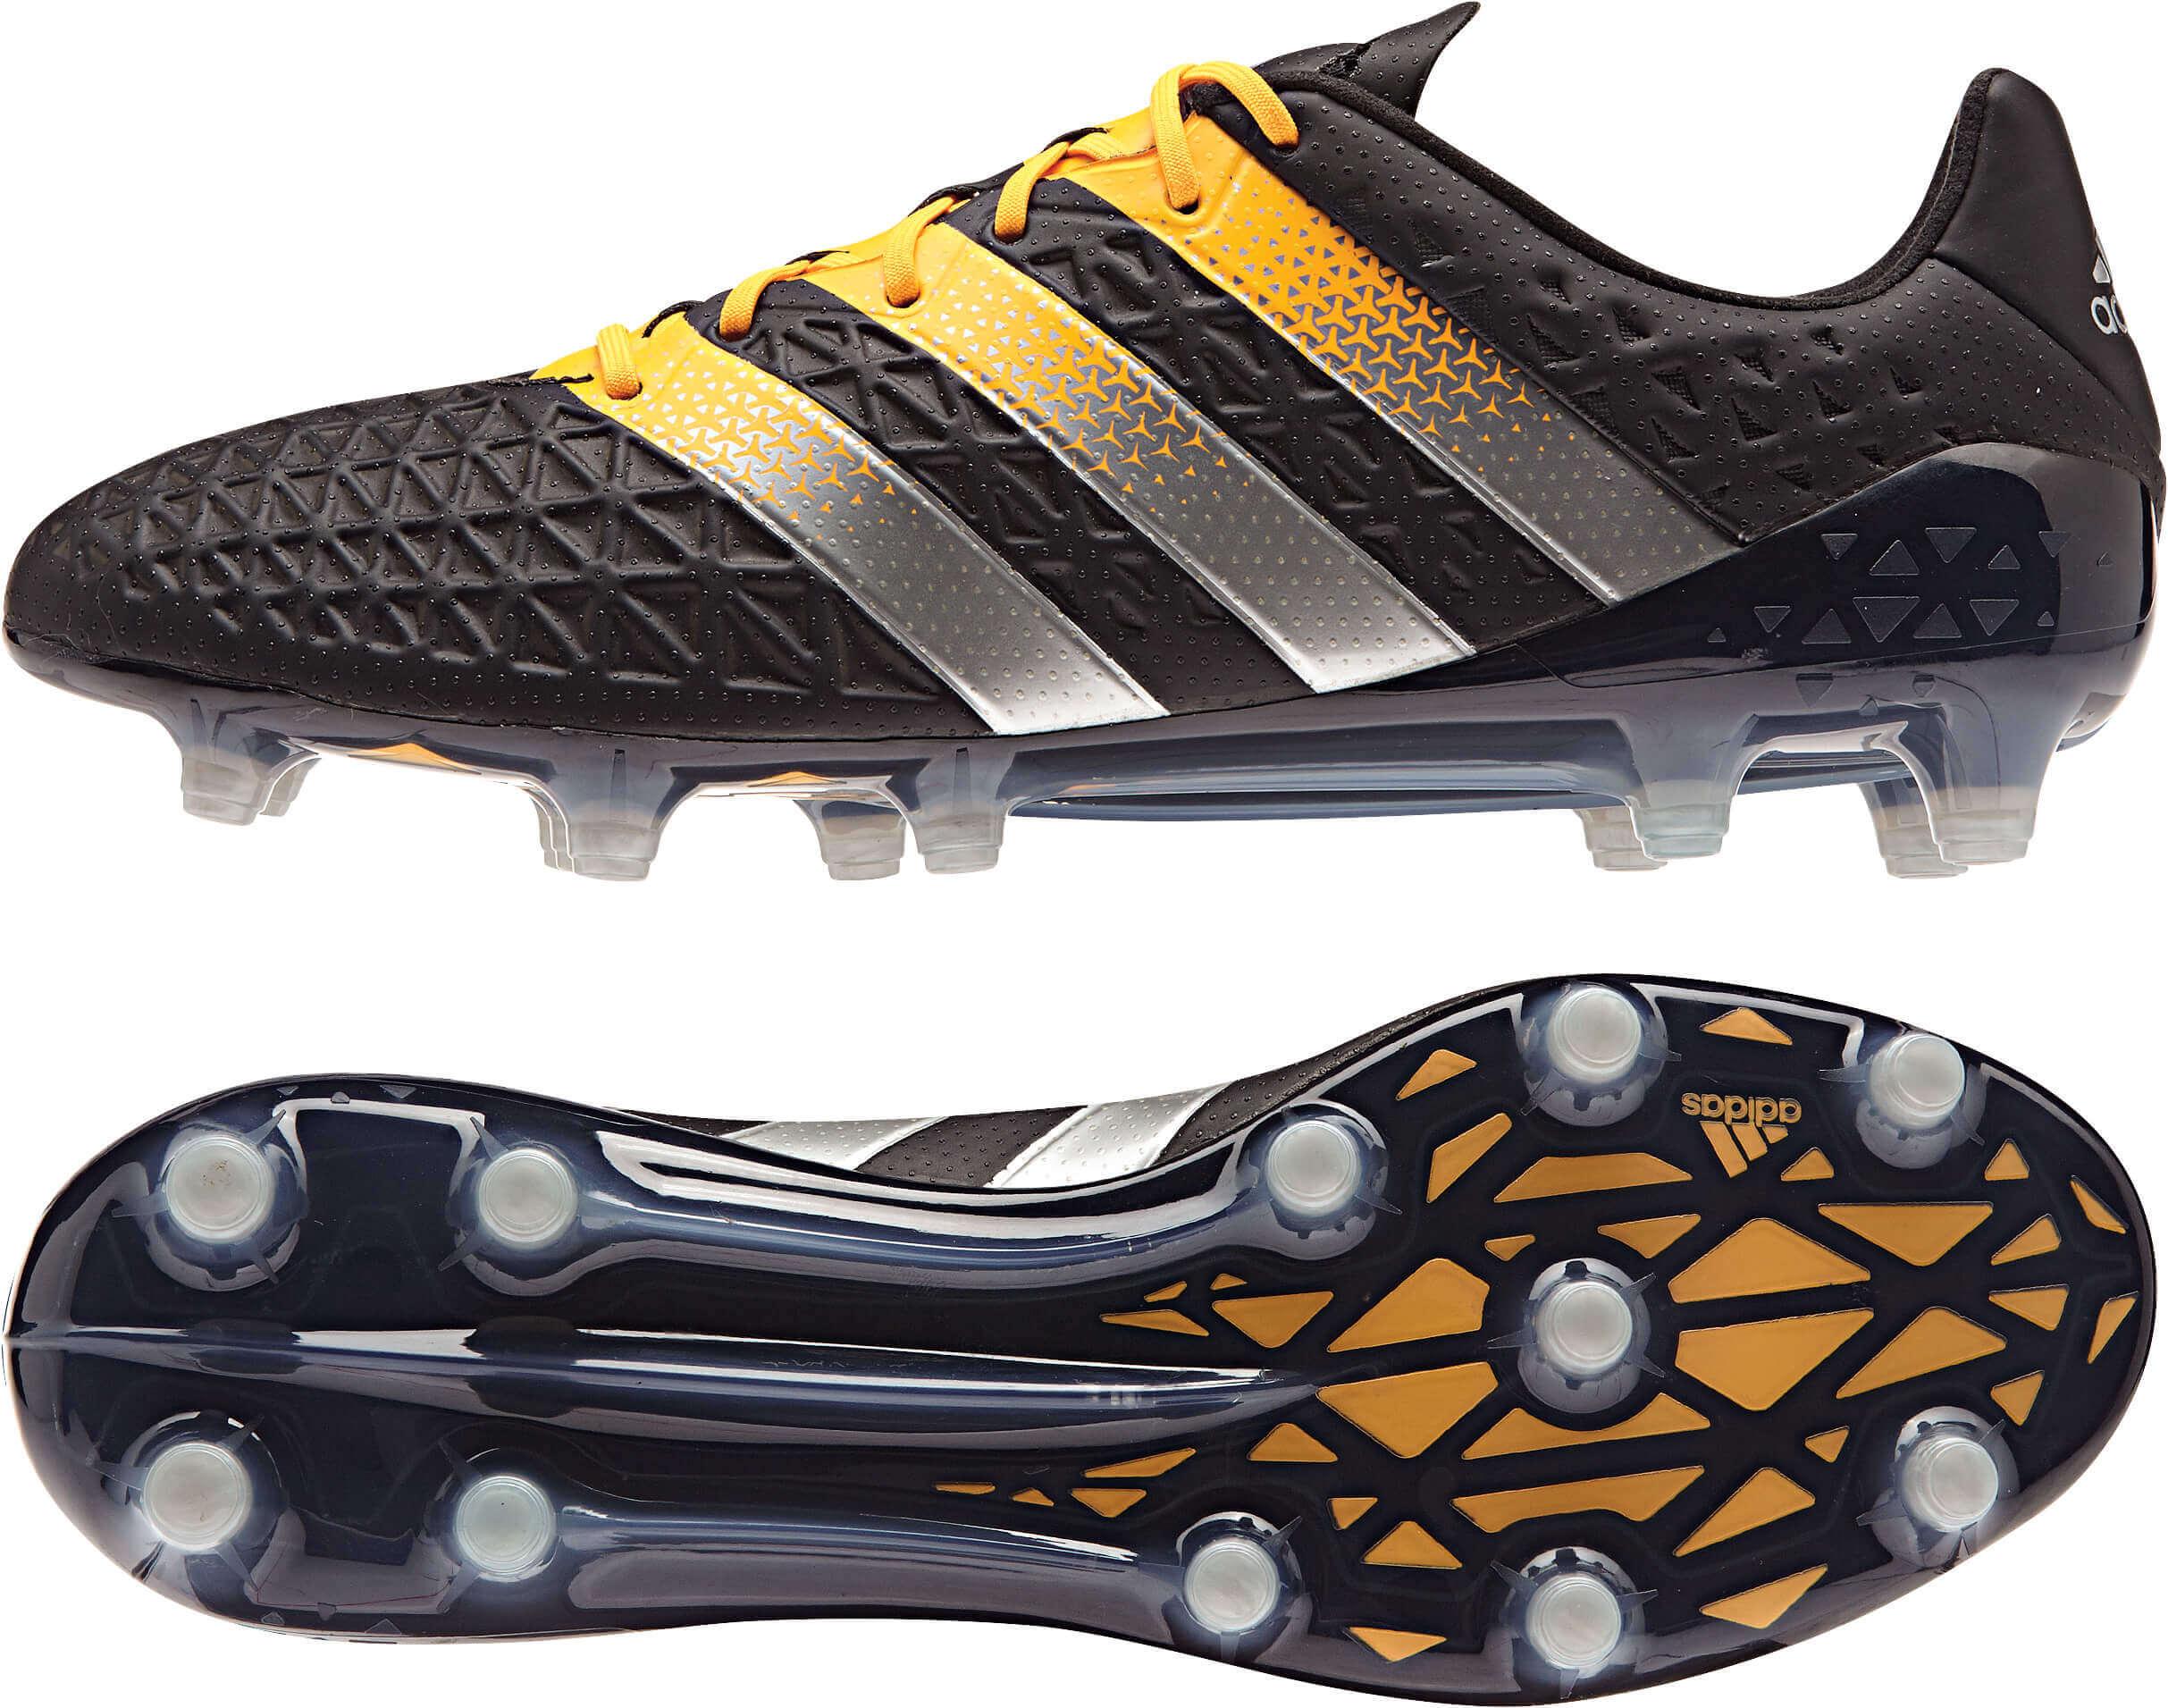 new concept ade9b 31ef7 adidas ACE 16.1 FG  AG - schwarz  ACE  adidas  Fussballschuhe  Sport  Bargfrede